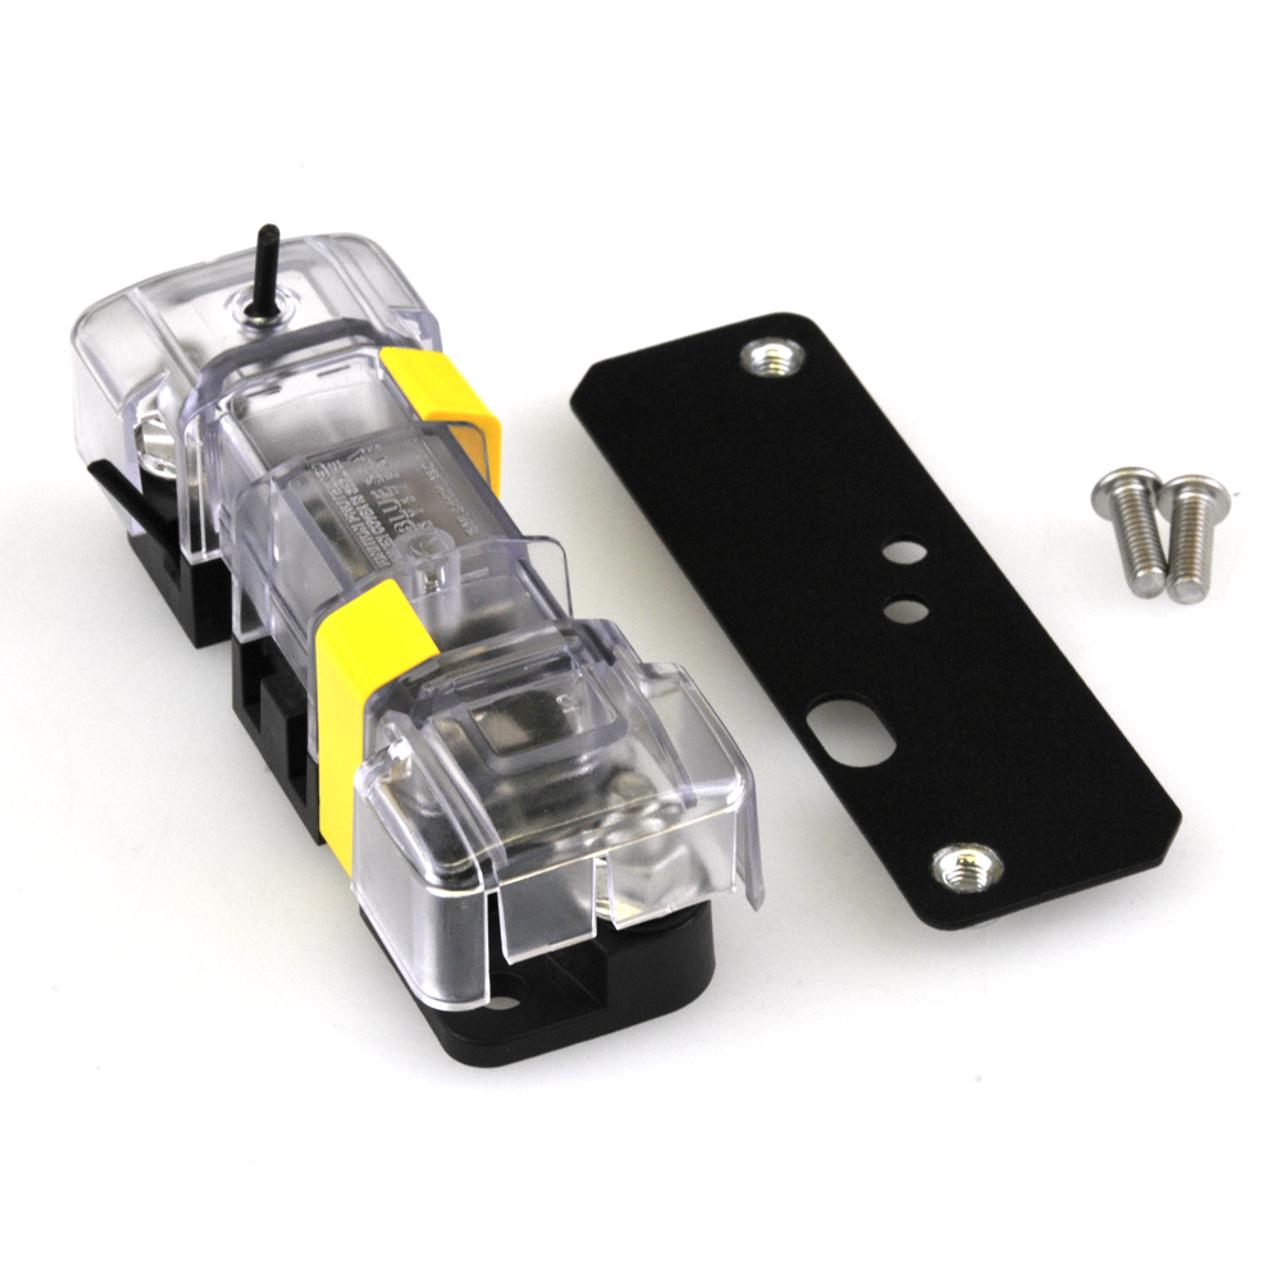 80 Series Mounting Bracket for the 7720 AMI/MIDI Safety Block Mounting Bracket (SBM-1)